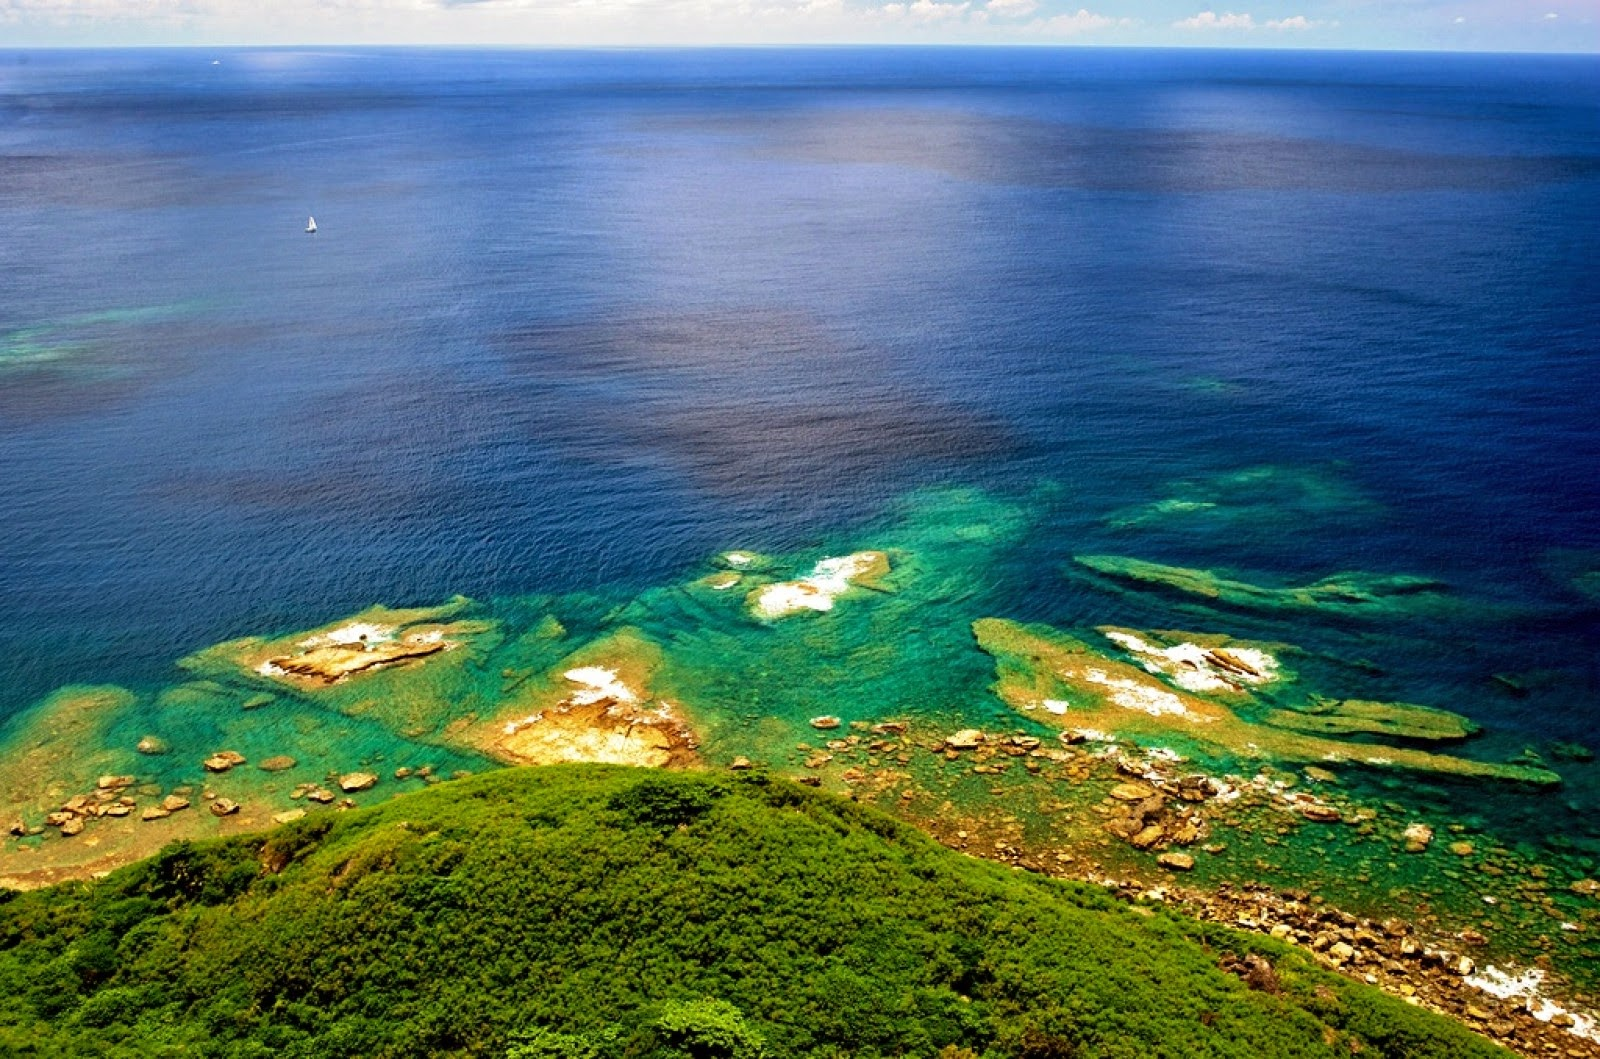 Japan Ogasawara Islands Photography Vacations